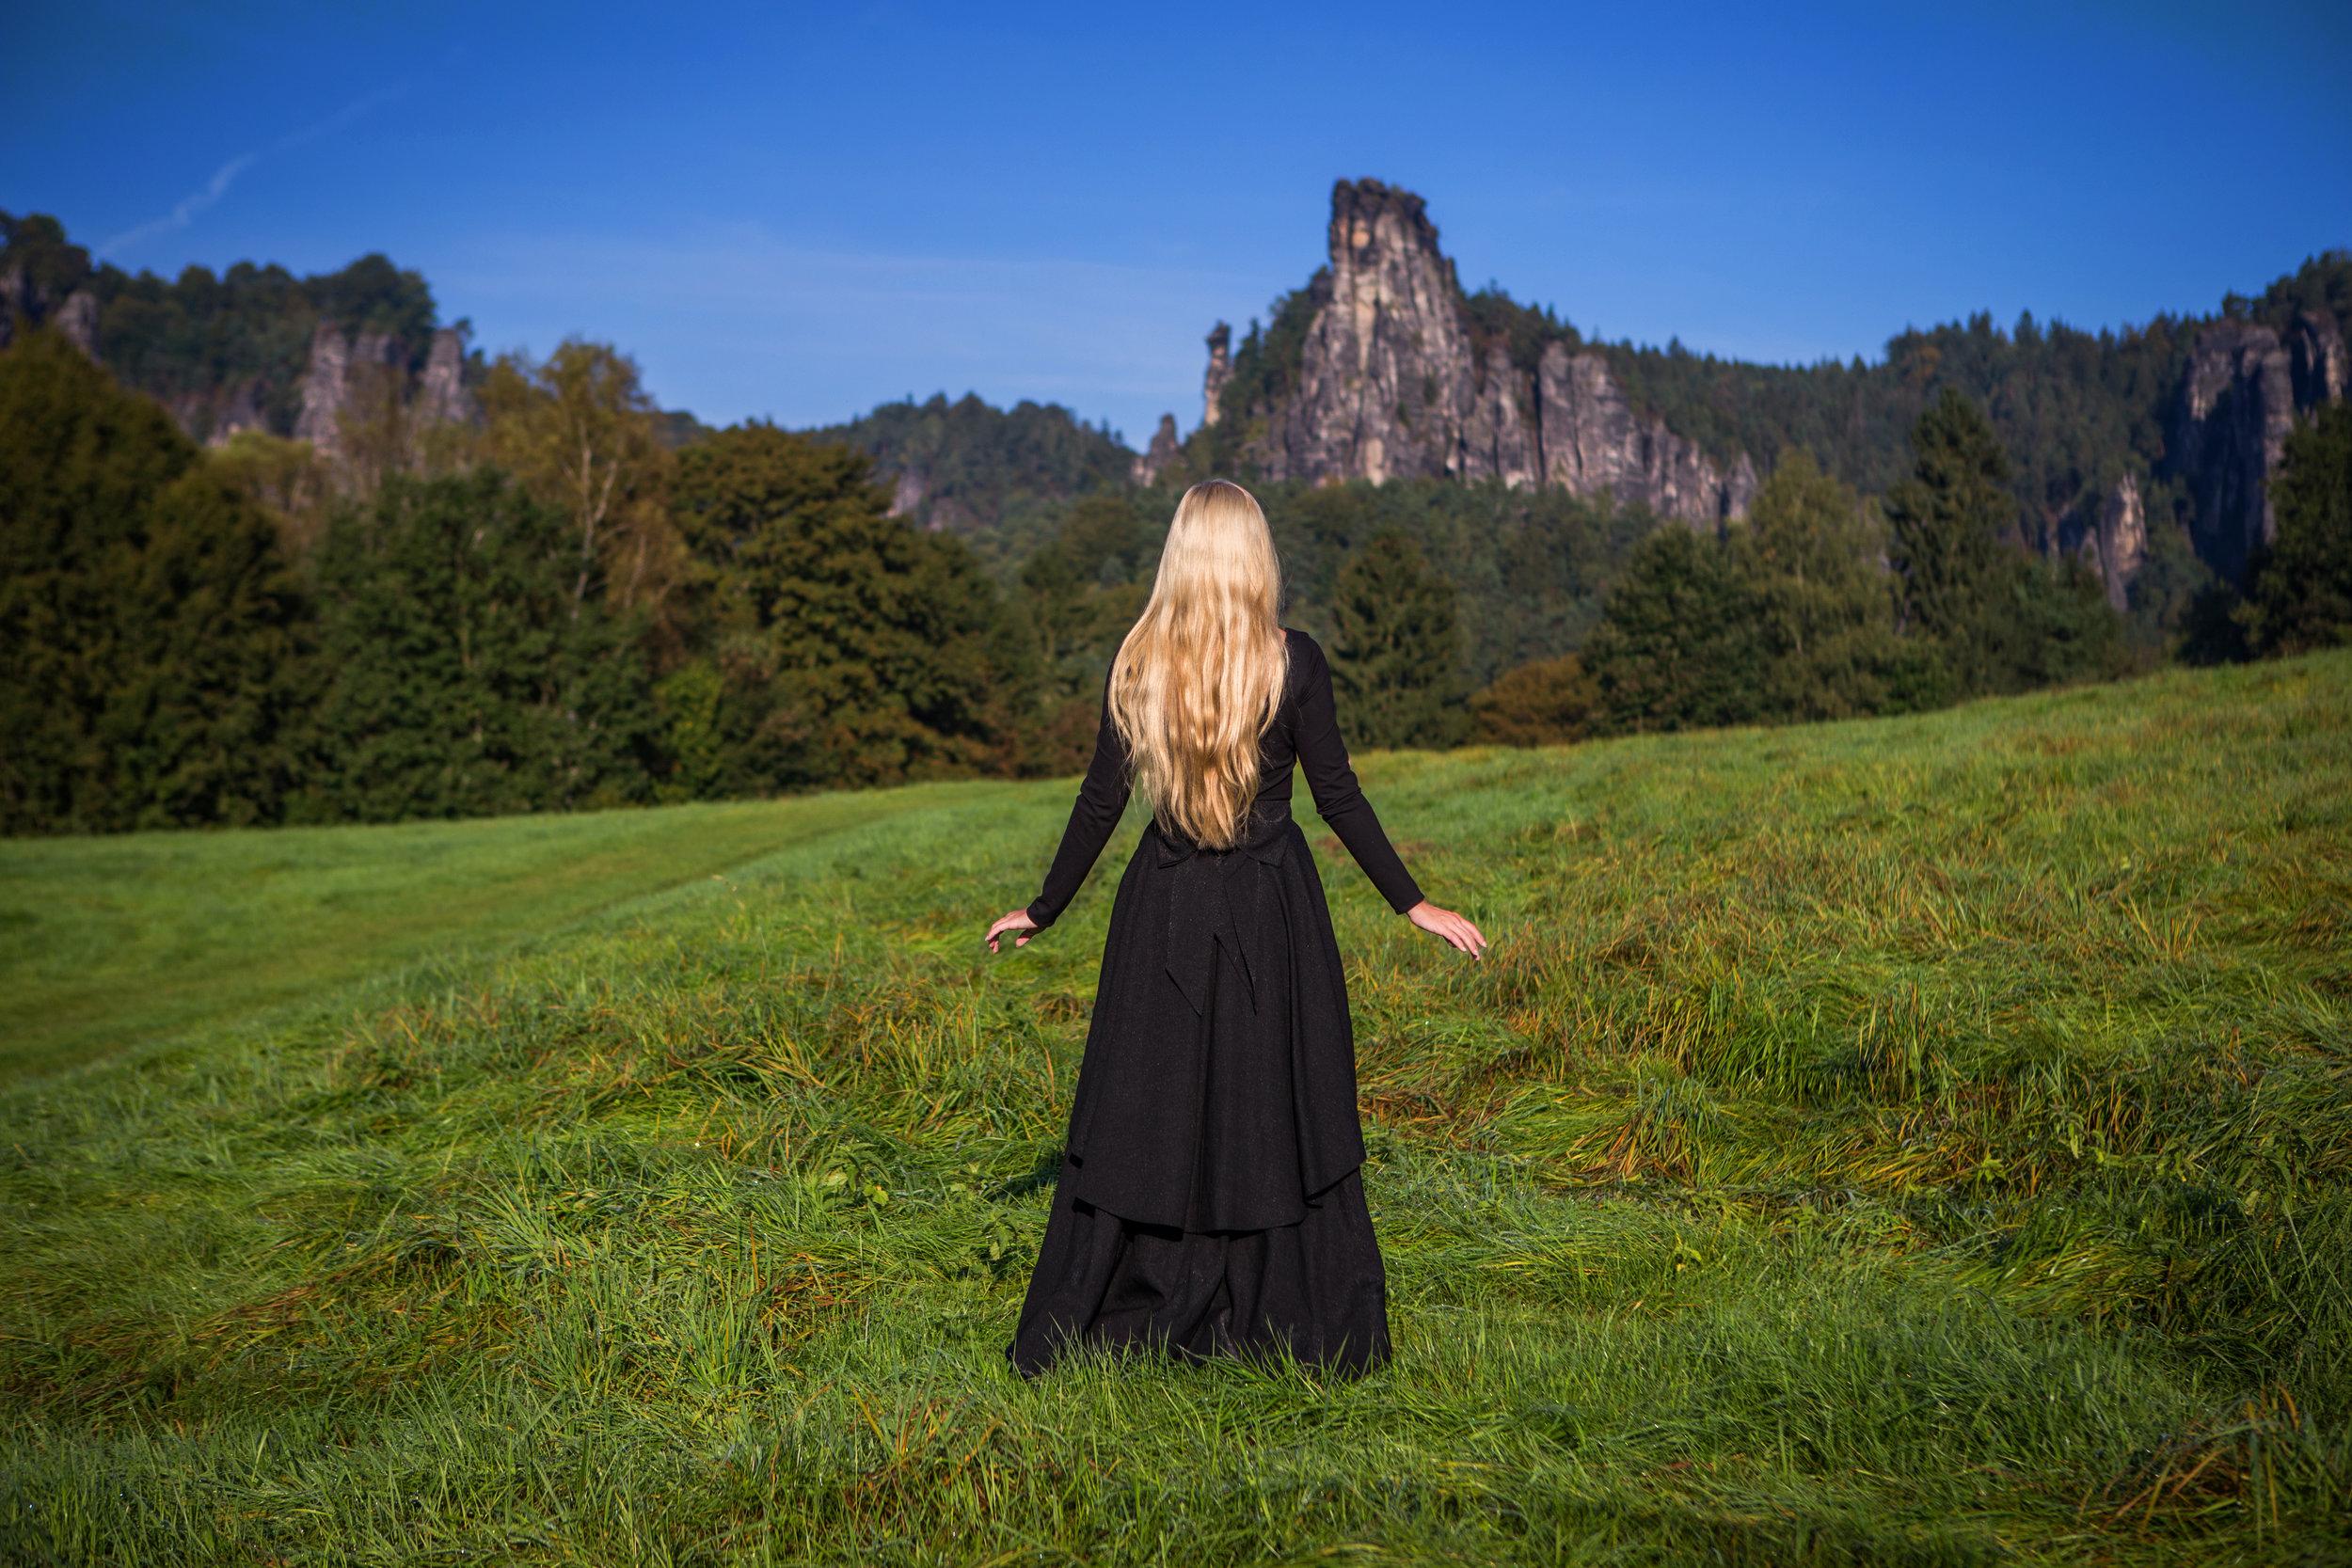 AstroBandit_Rathen_Elbe_Sandstone_Mountains_Saxony_Germany_5.jpg